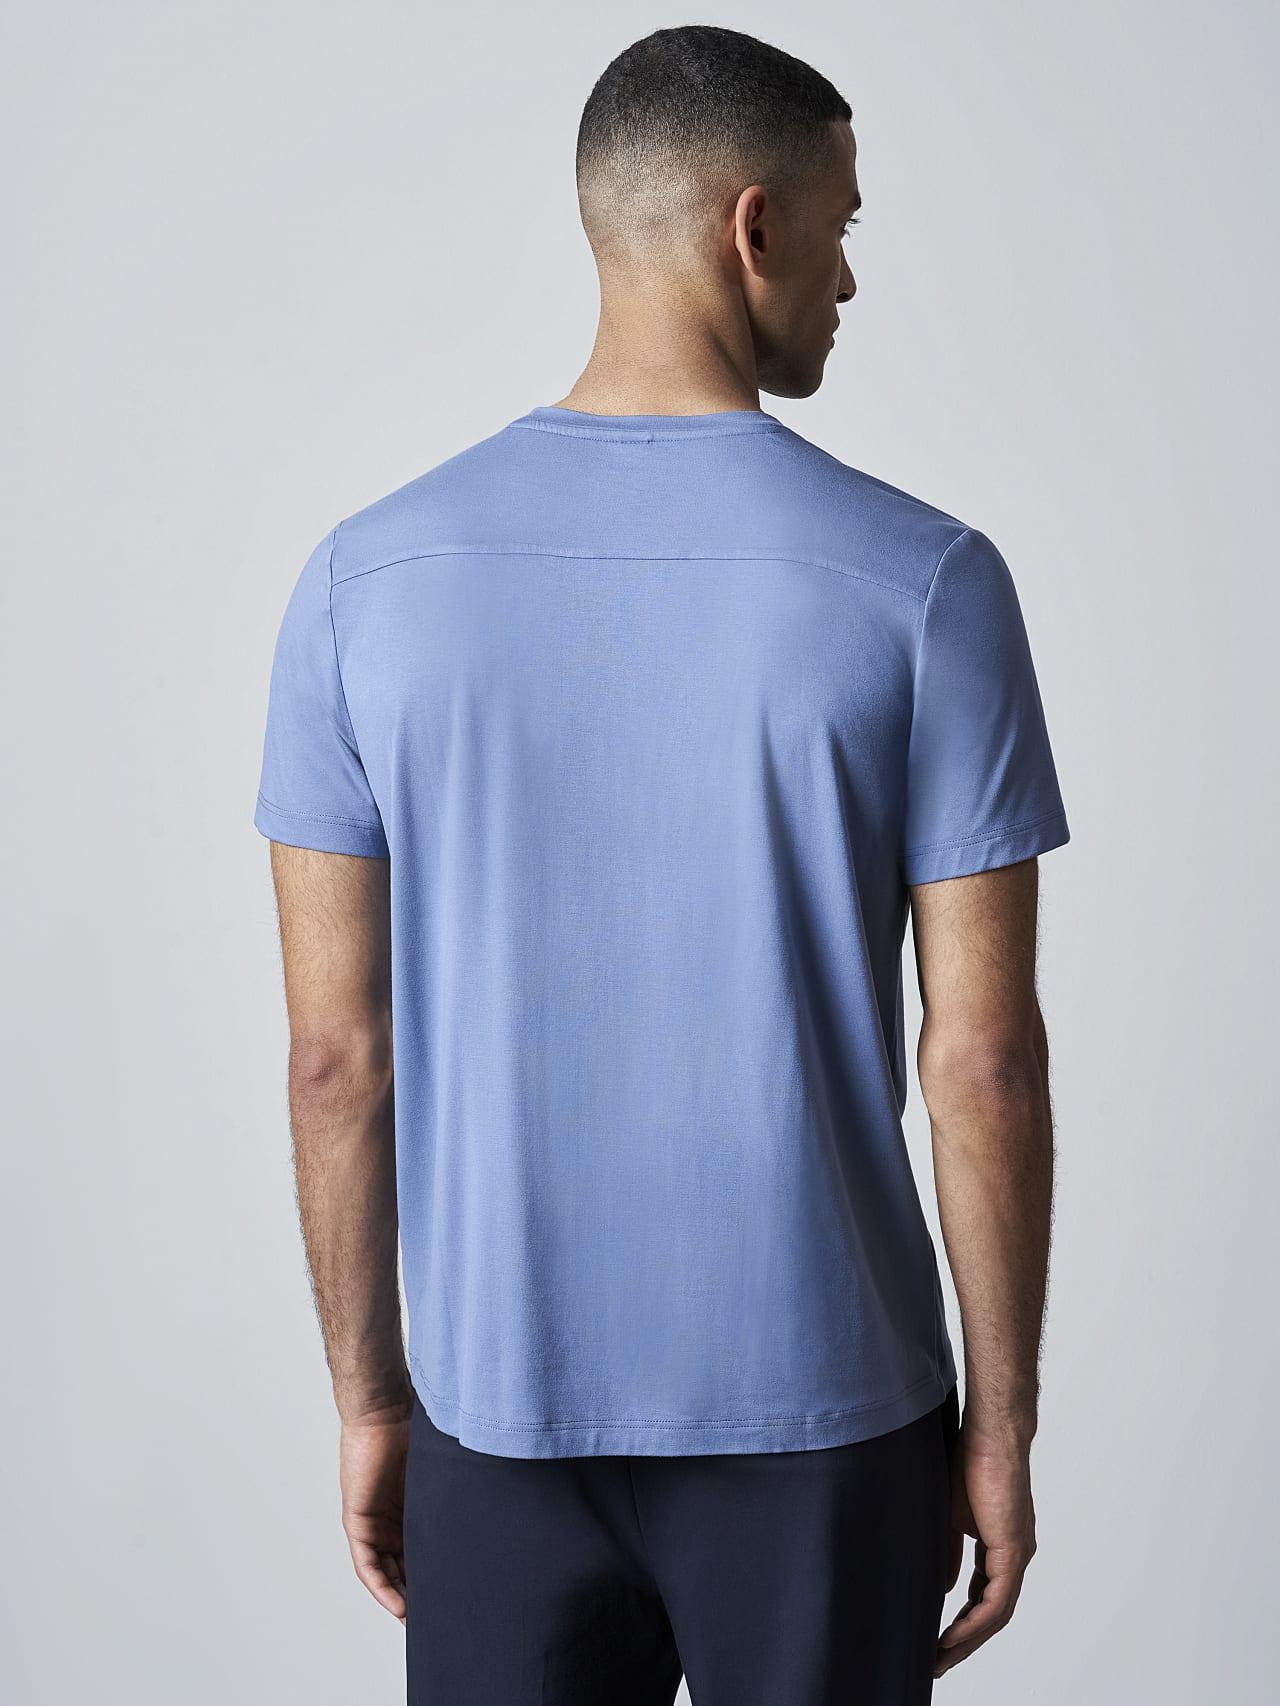 JANUE V1.Y5.02 Viscose T-Shirt light blue Front Main Alpha Tauri